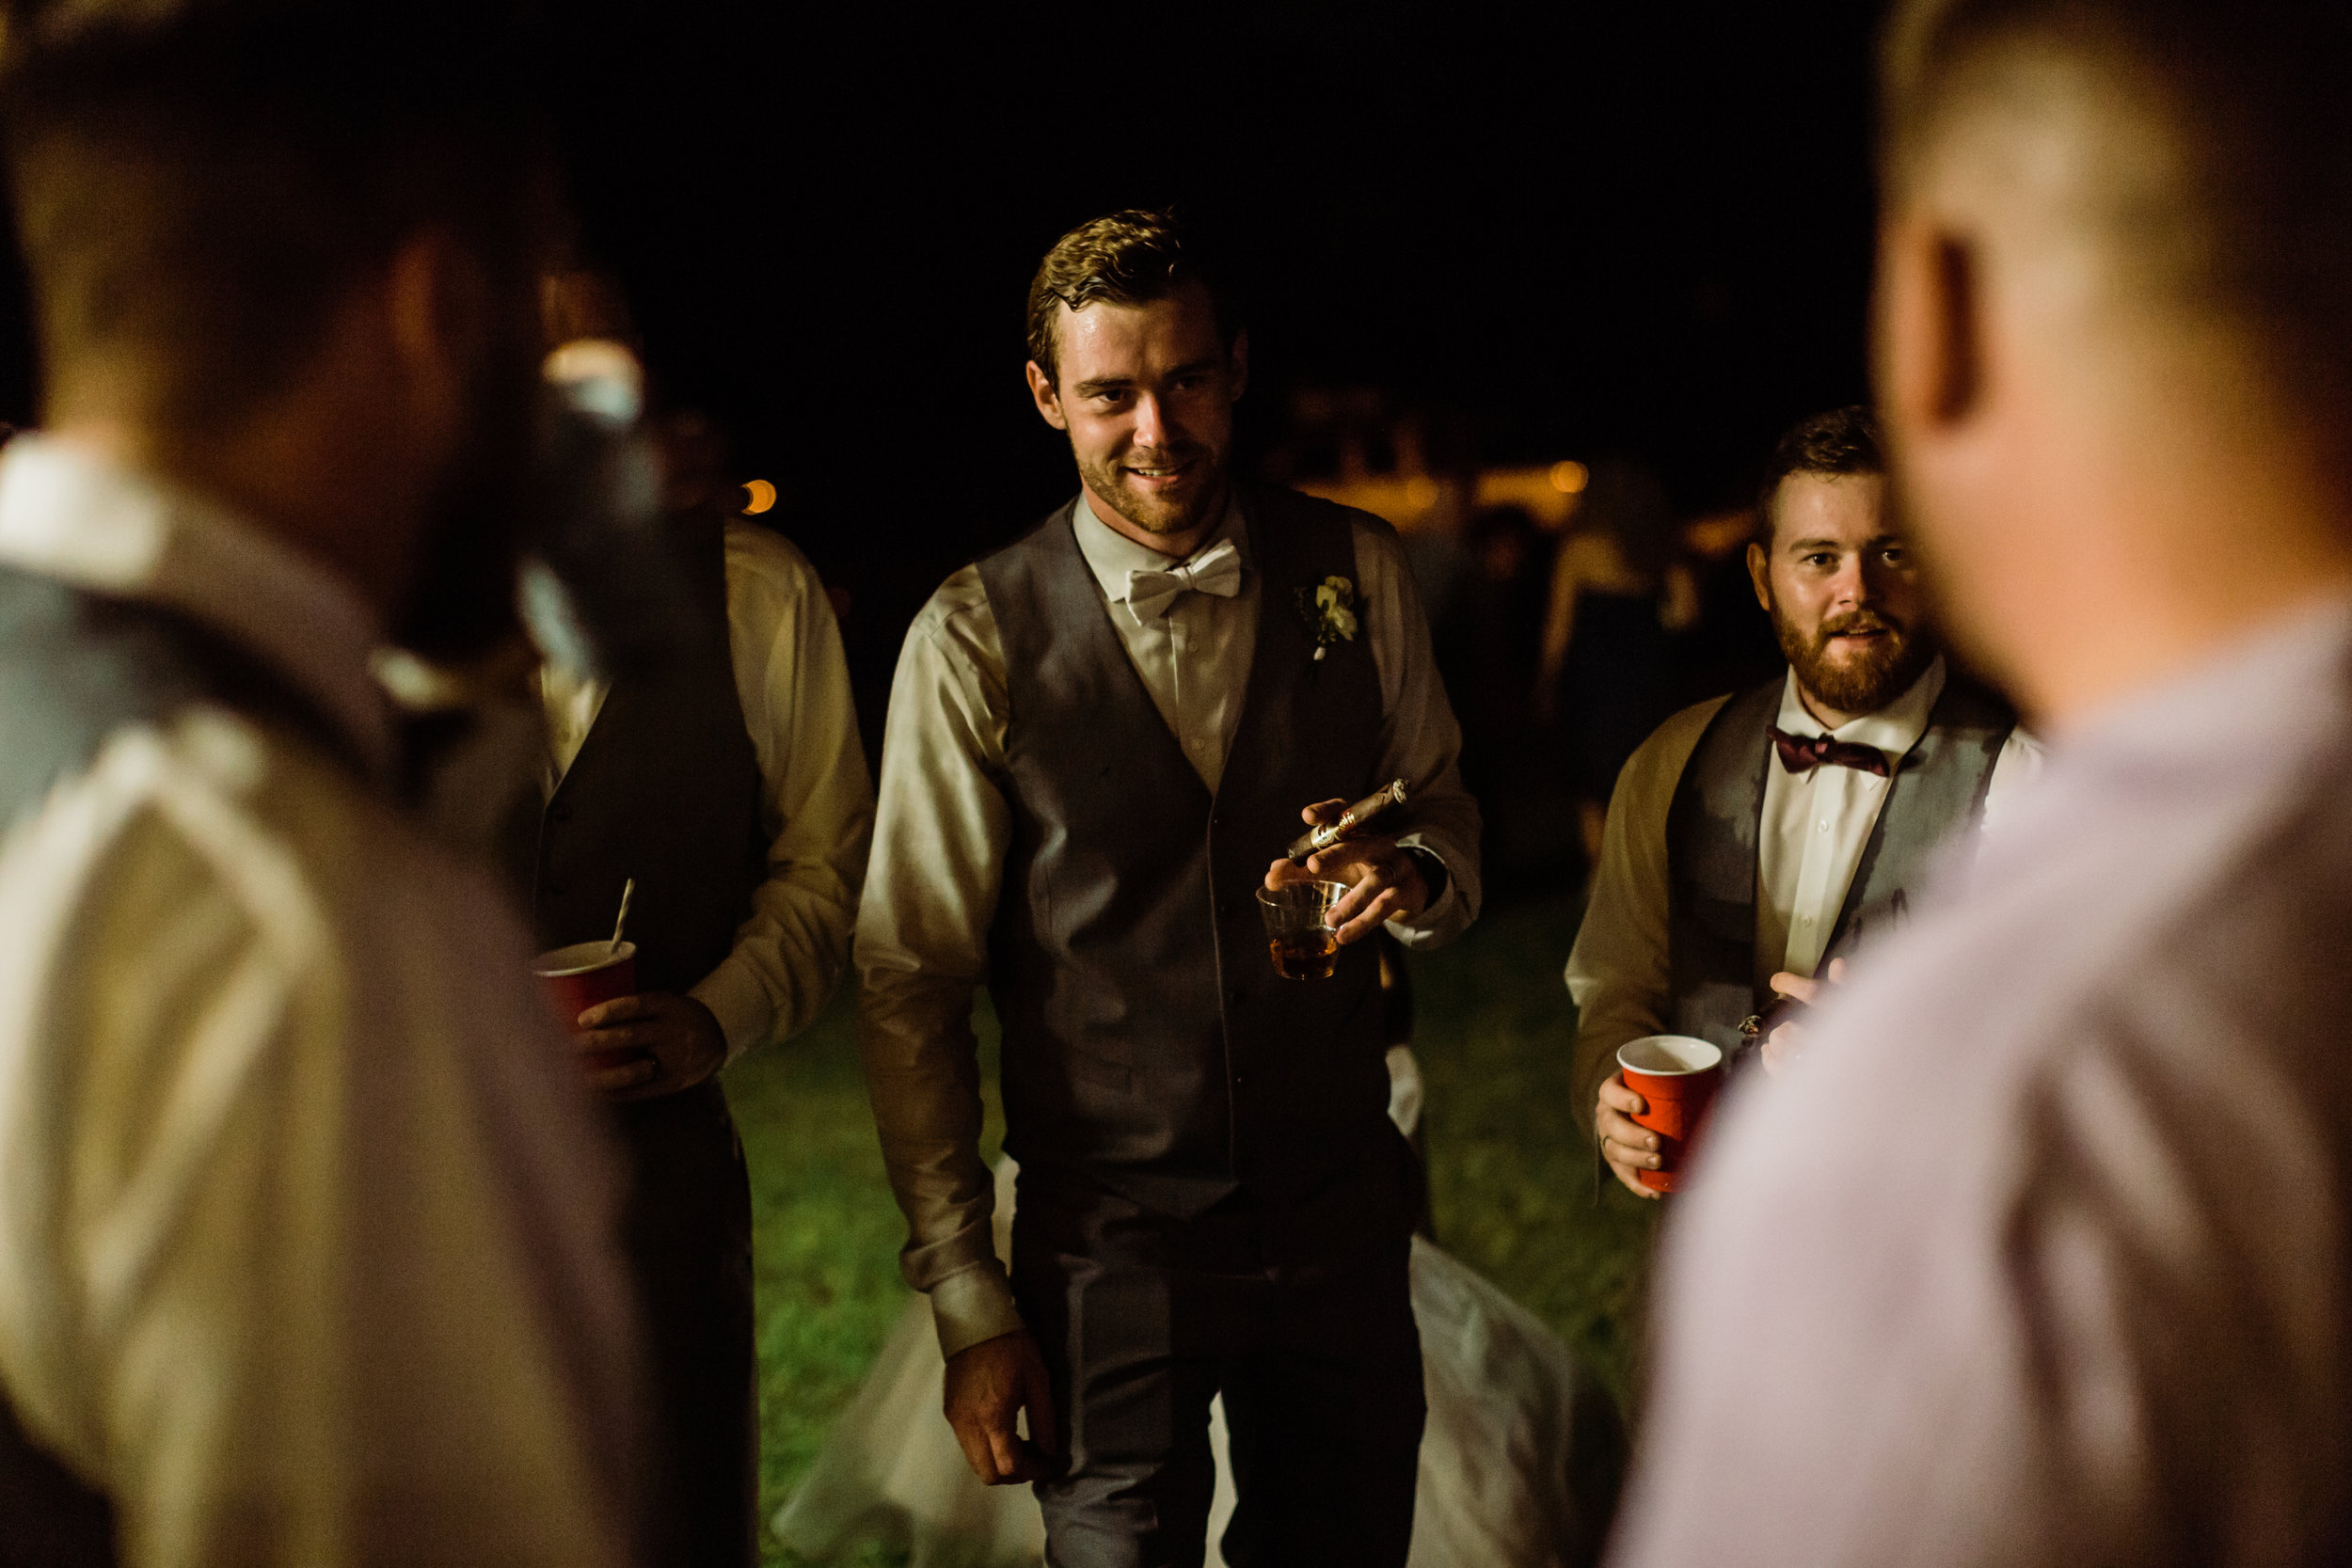 2017.10.14 Samantha and Matthew Crabtree Sarasota Wedding (608 of 708).jpg